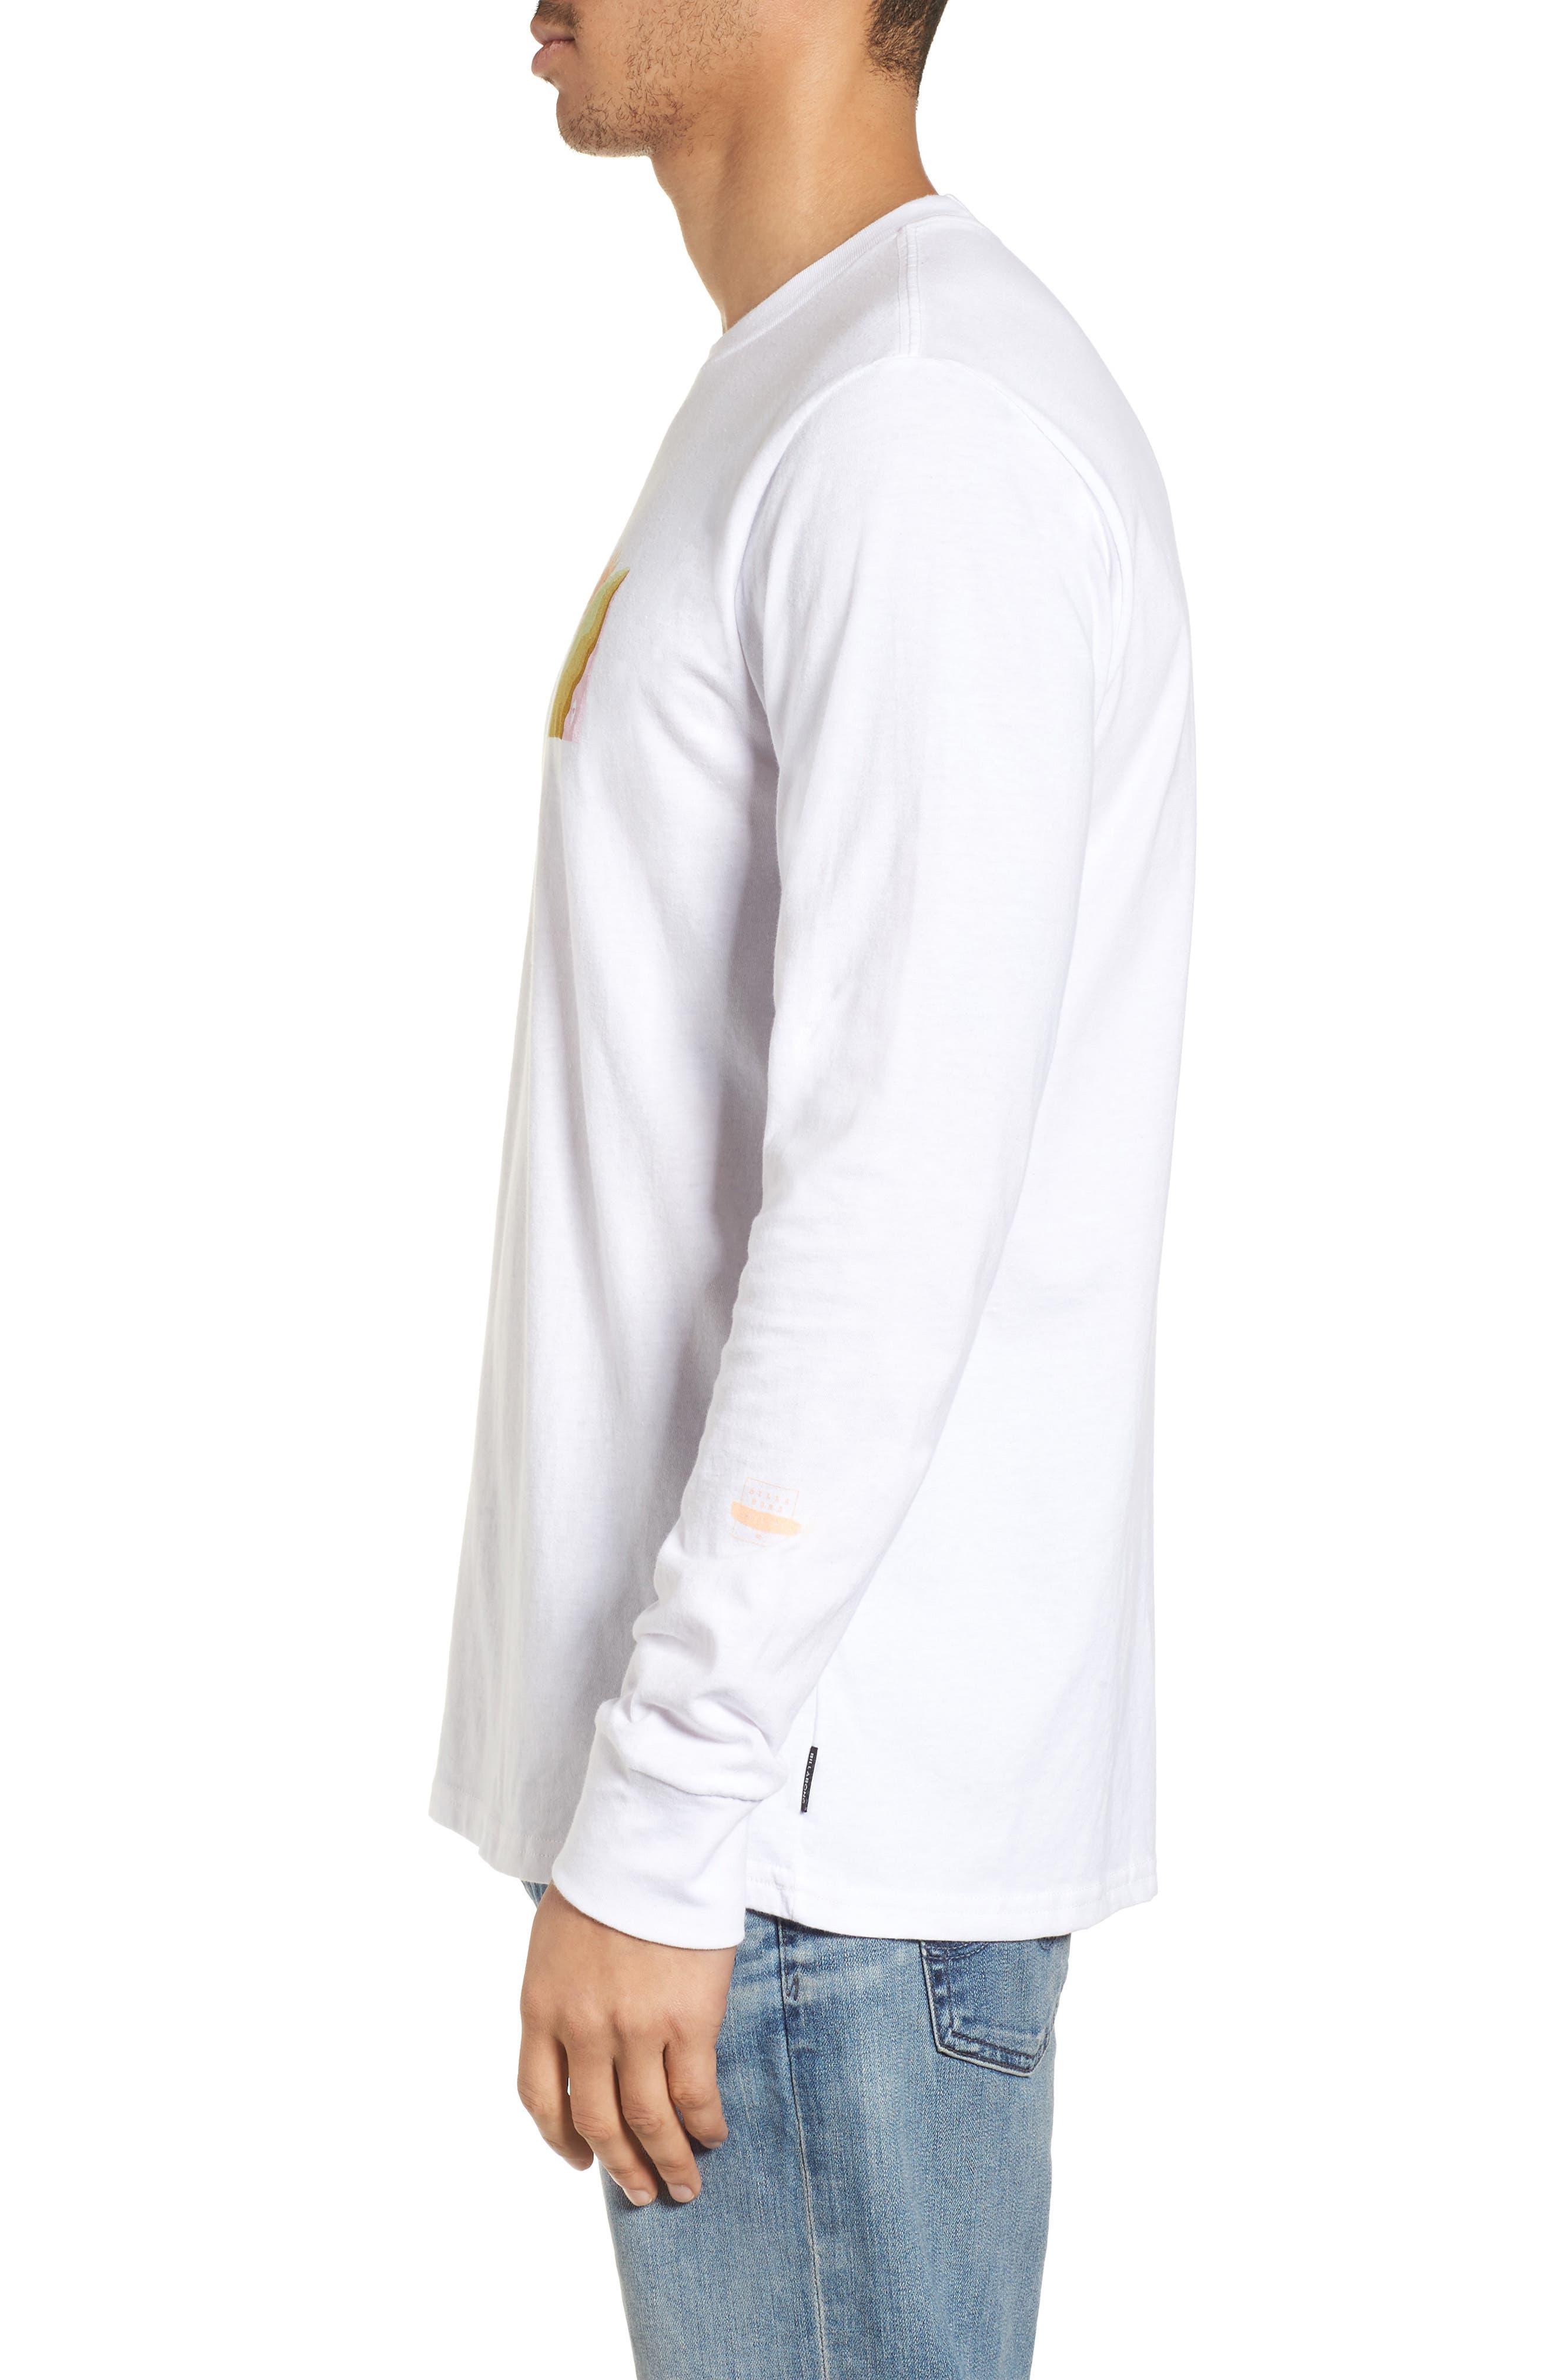 Wandering Eye Embroidered Long Sleeve T-Shirt,                             Alternate thumbnail 4, color,                             White